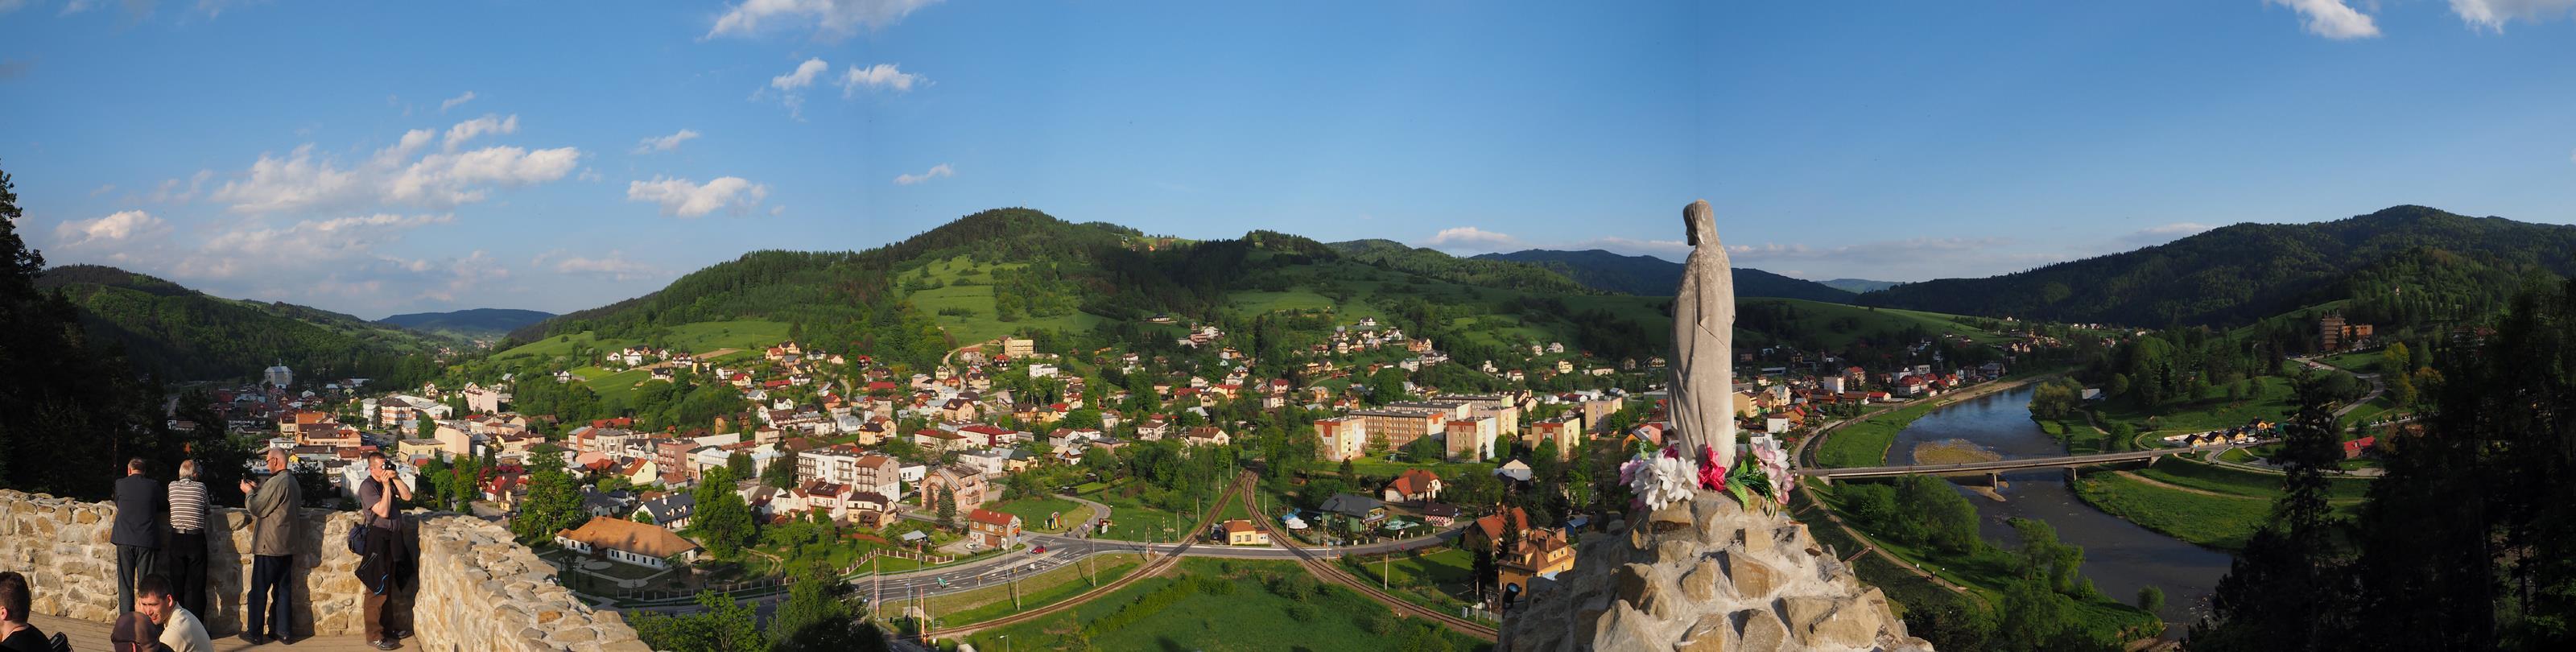 Panorama Muszyny z ruin zamku